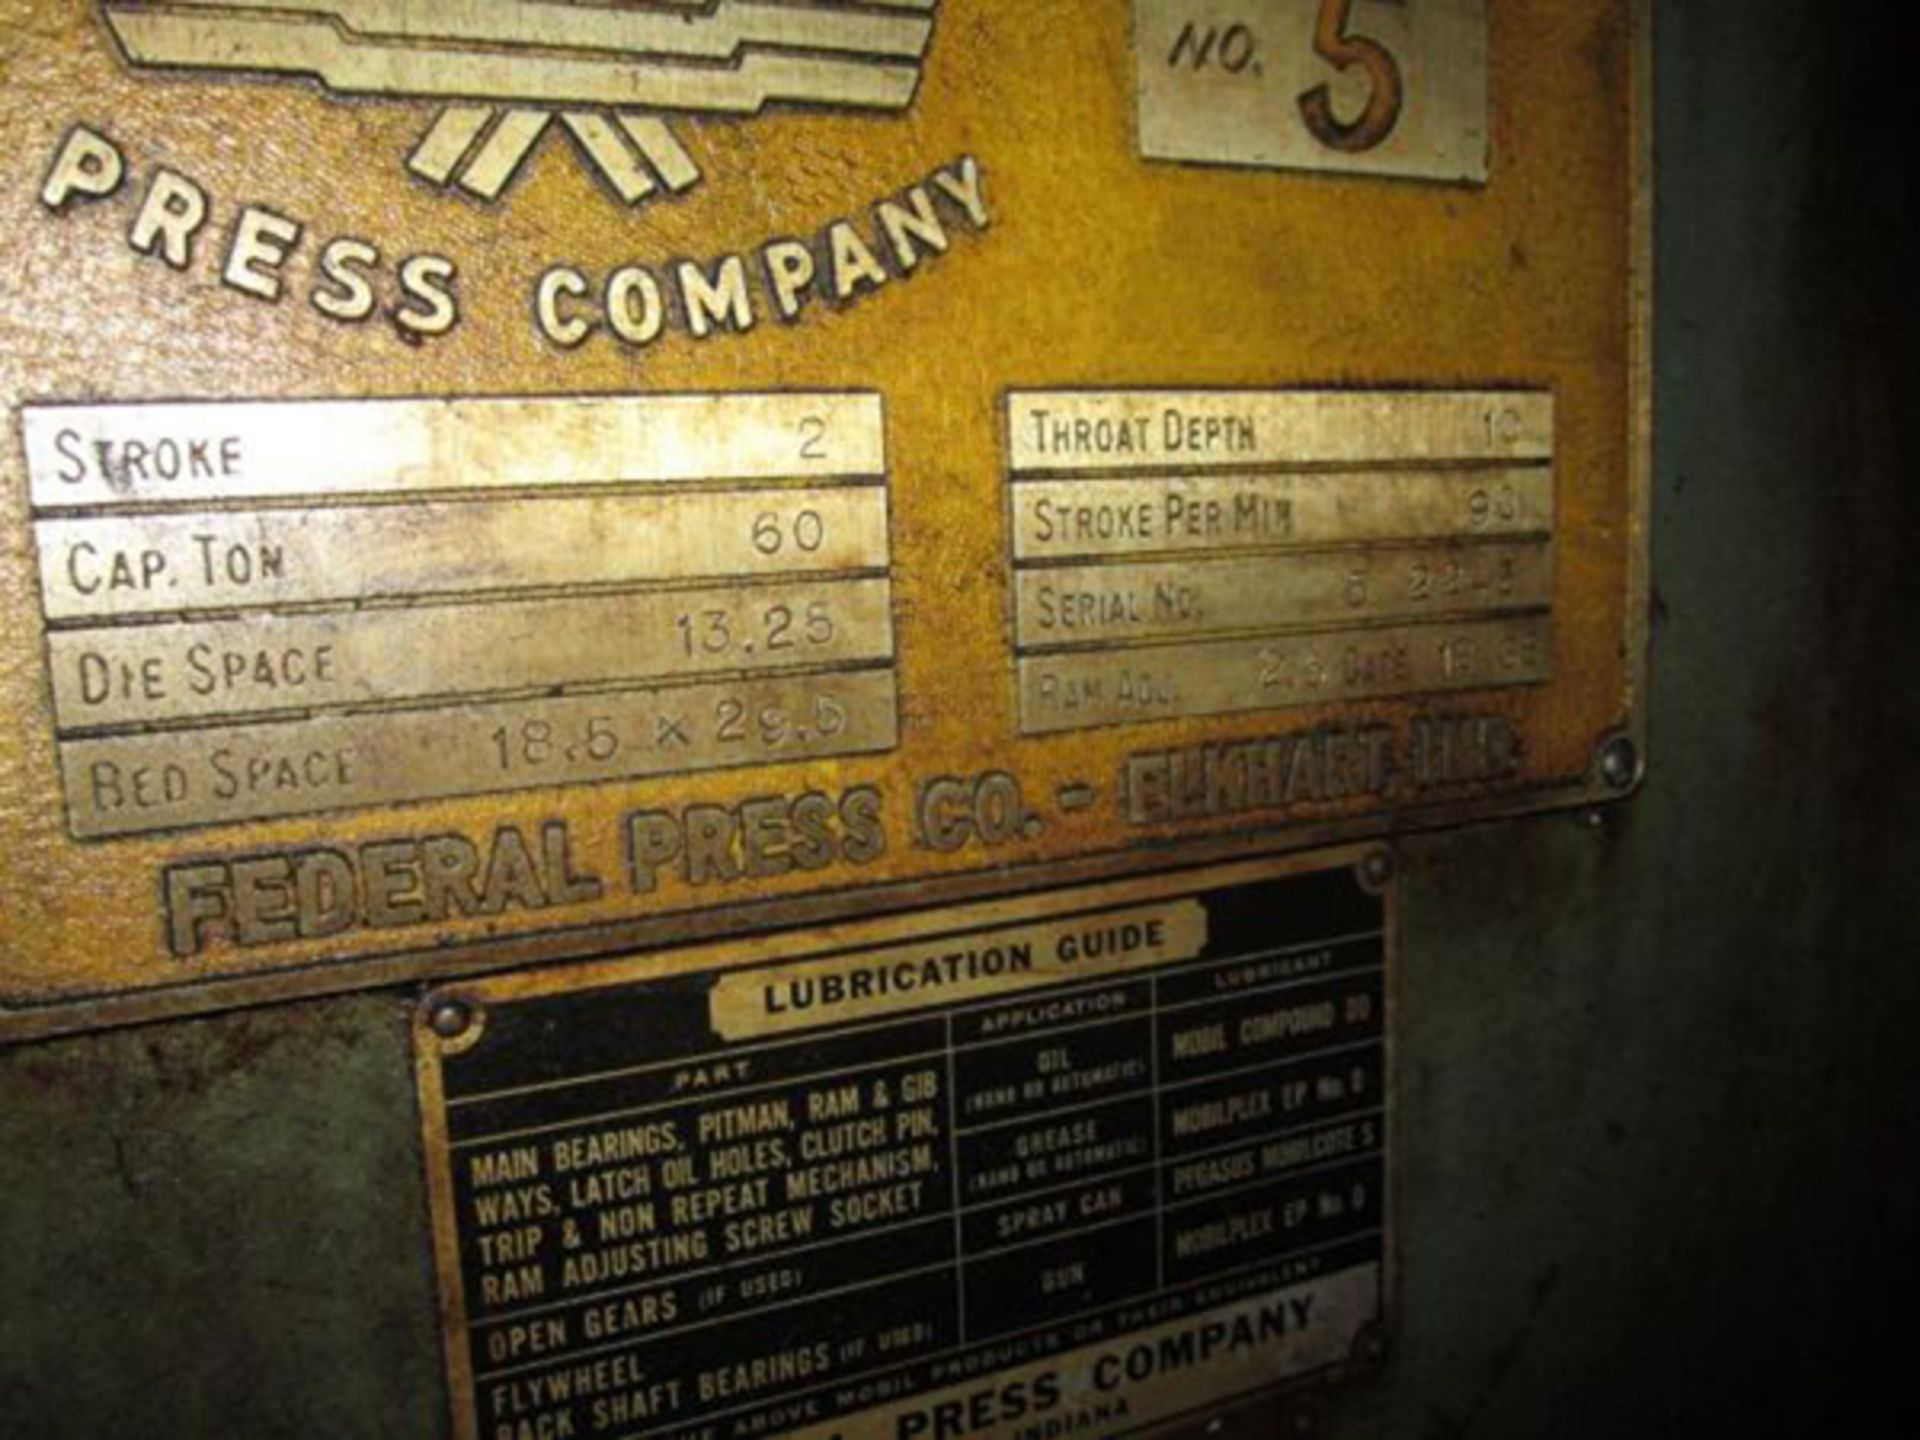 "Federal OBI Punch Press   60-Ton x 29 1/2"" x 18 1/2"", Mdl: F-5, S/N: 125400 - 6397P - Image 6 of 6"